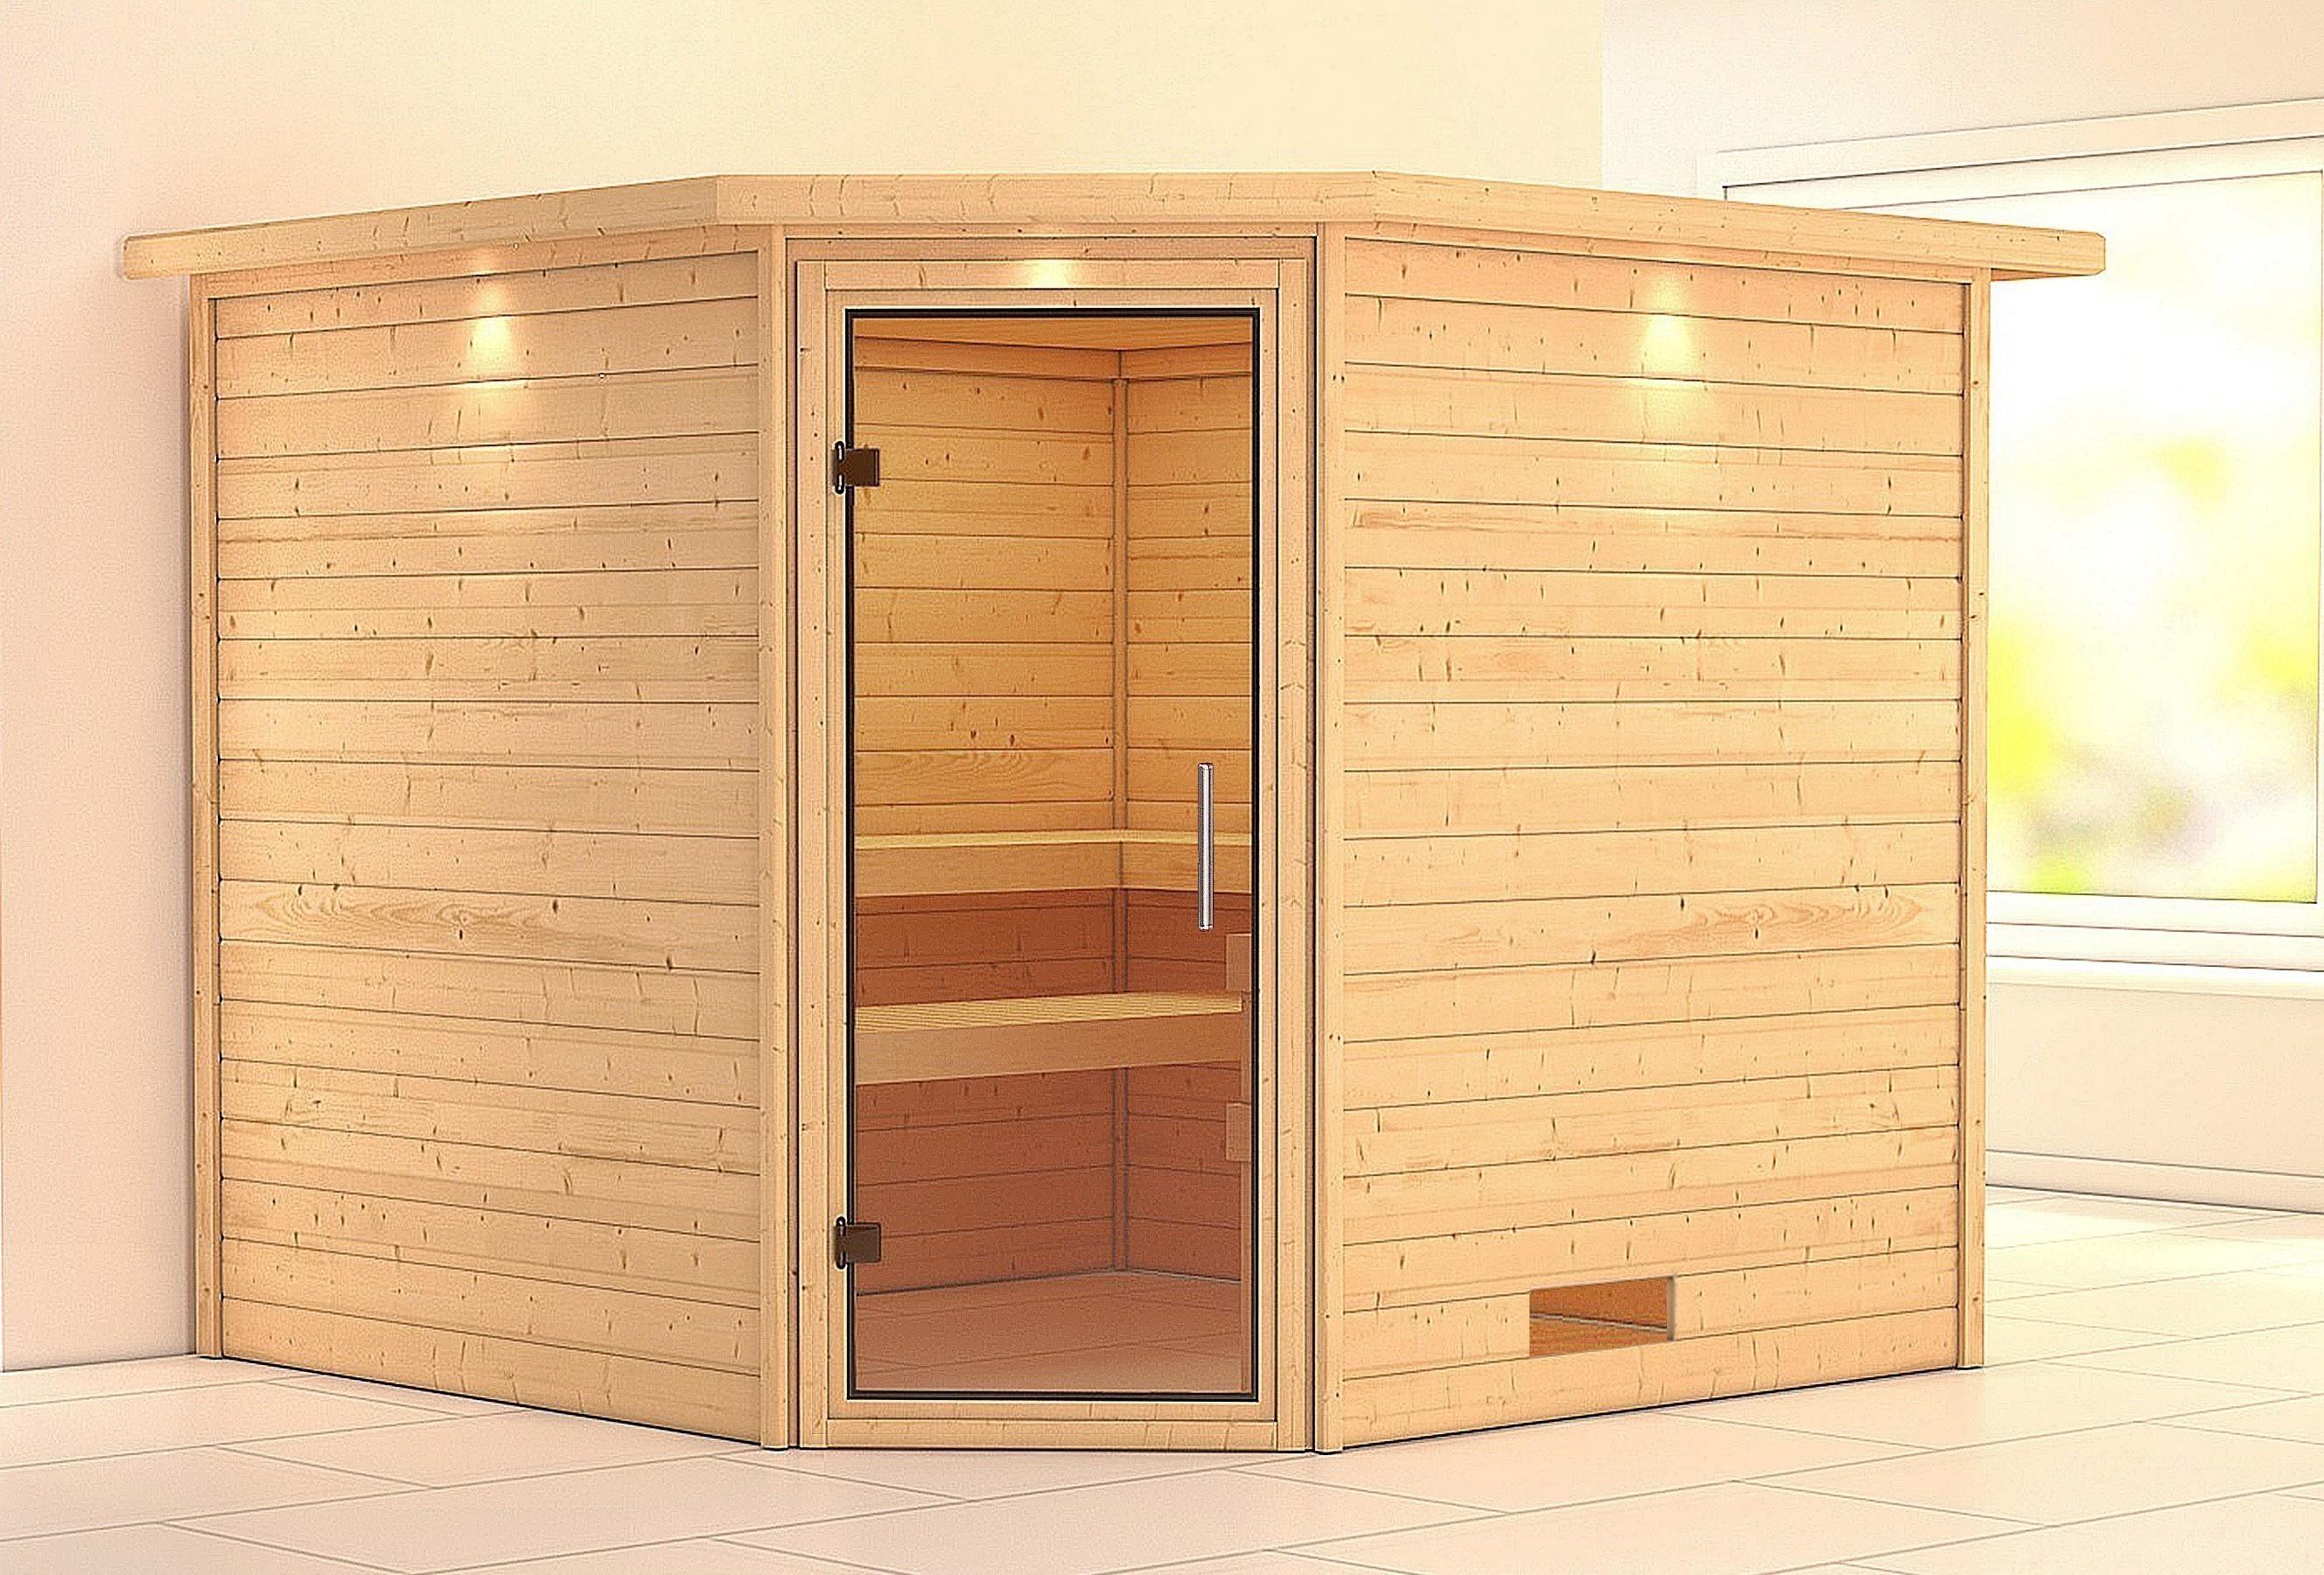 Woodfeeling Sauna Leona 38mm Kranz ohne Ofen Tür Klarglas Bild 1